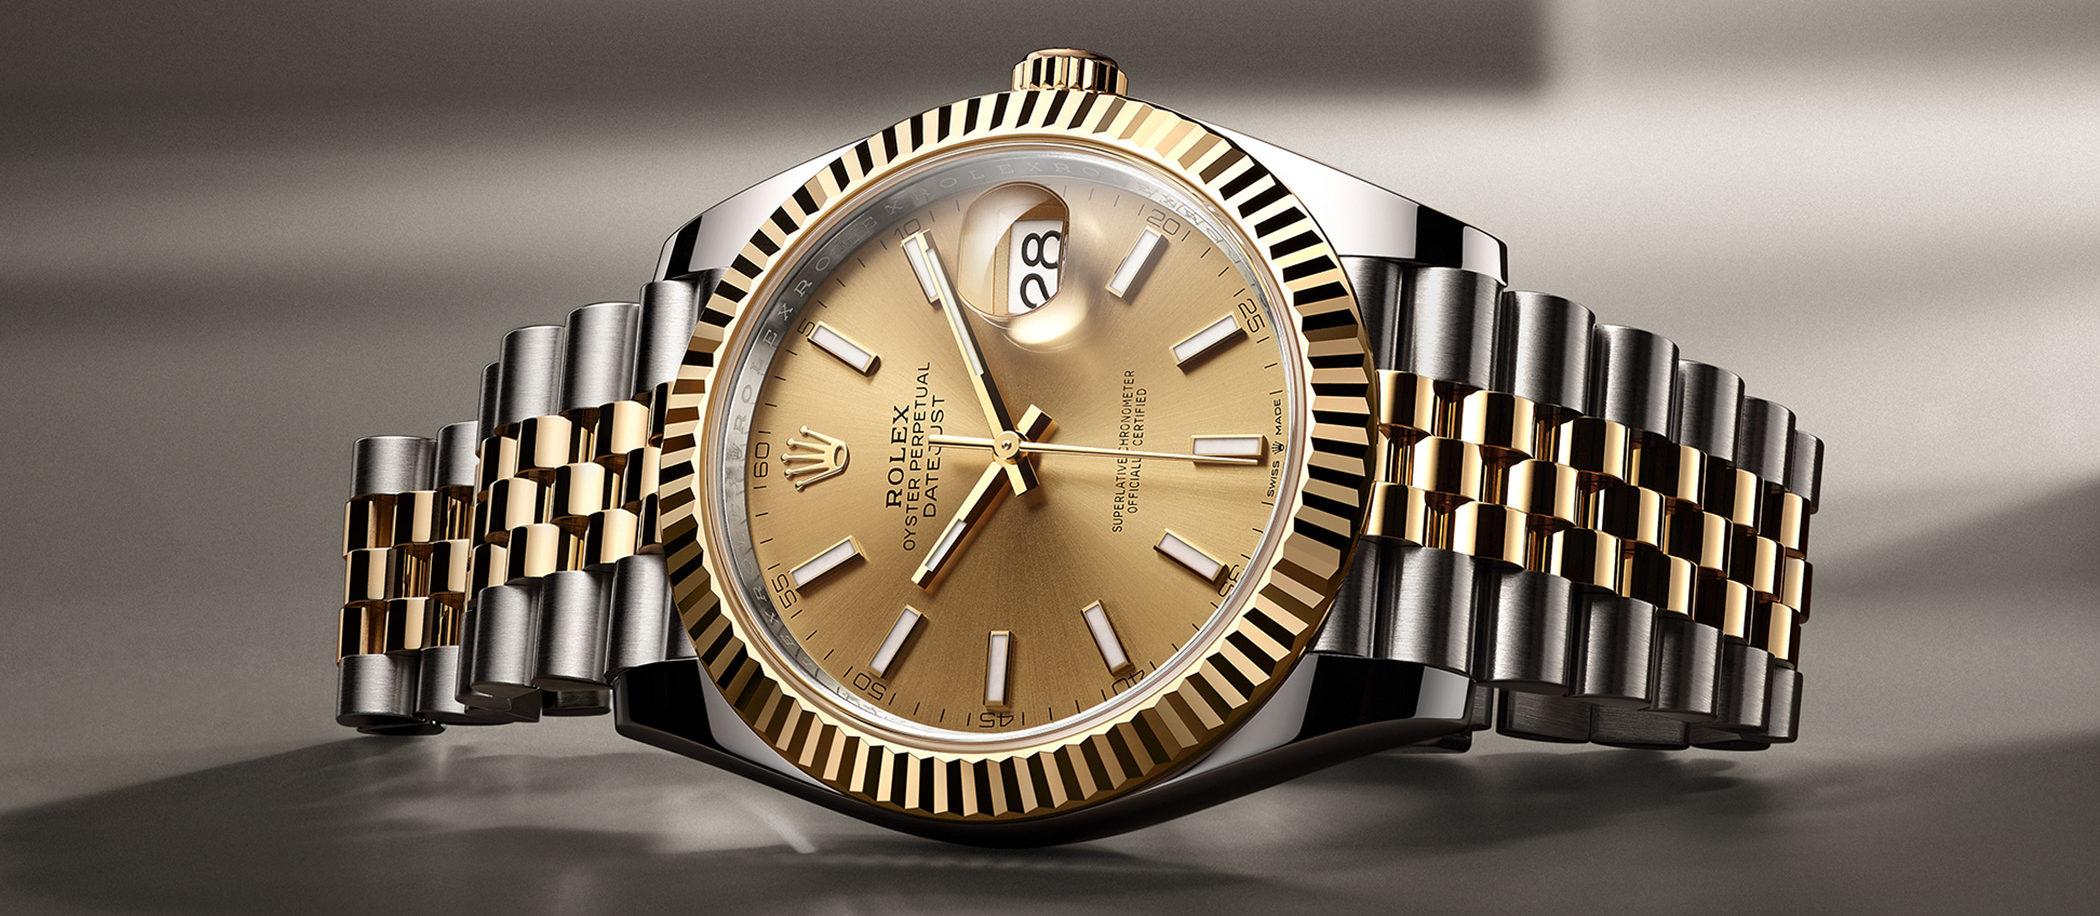 Kultowe Zegarki - Rolex Datejust